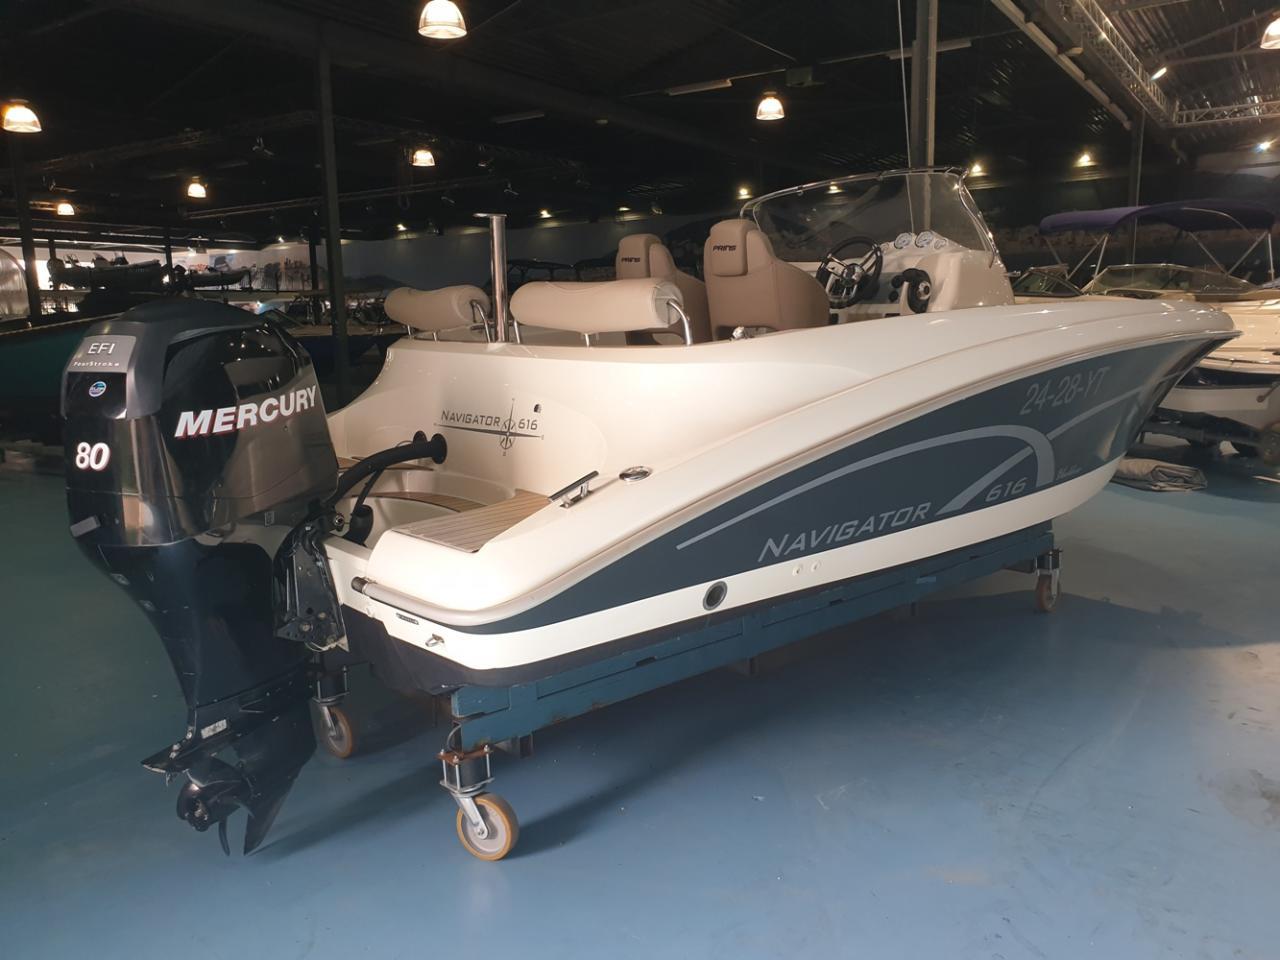 Prins 616 Navigator met Mercury 80 pk 2